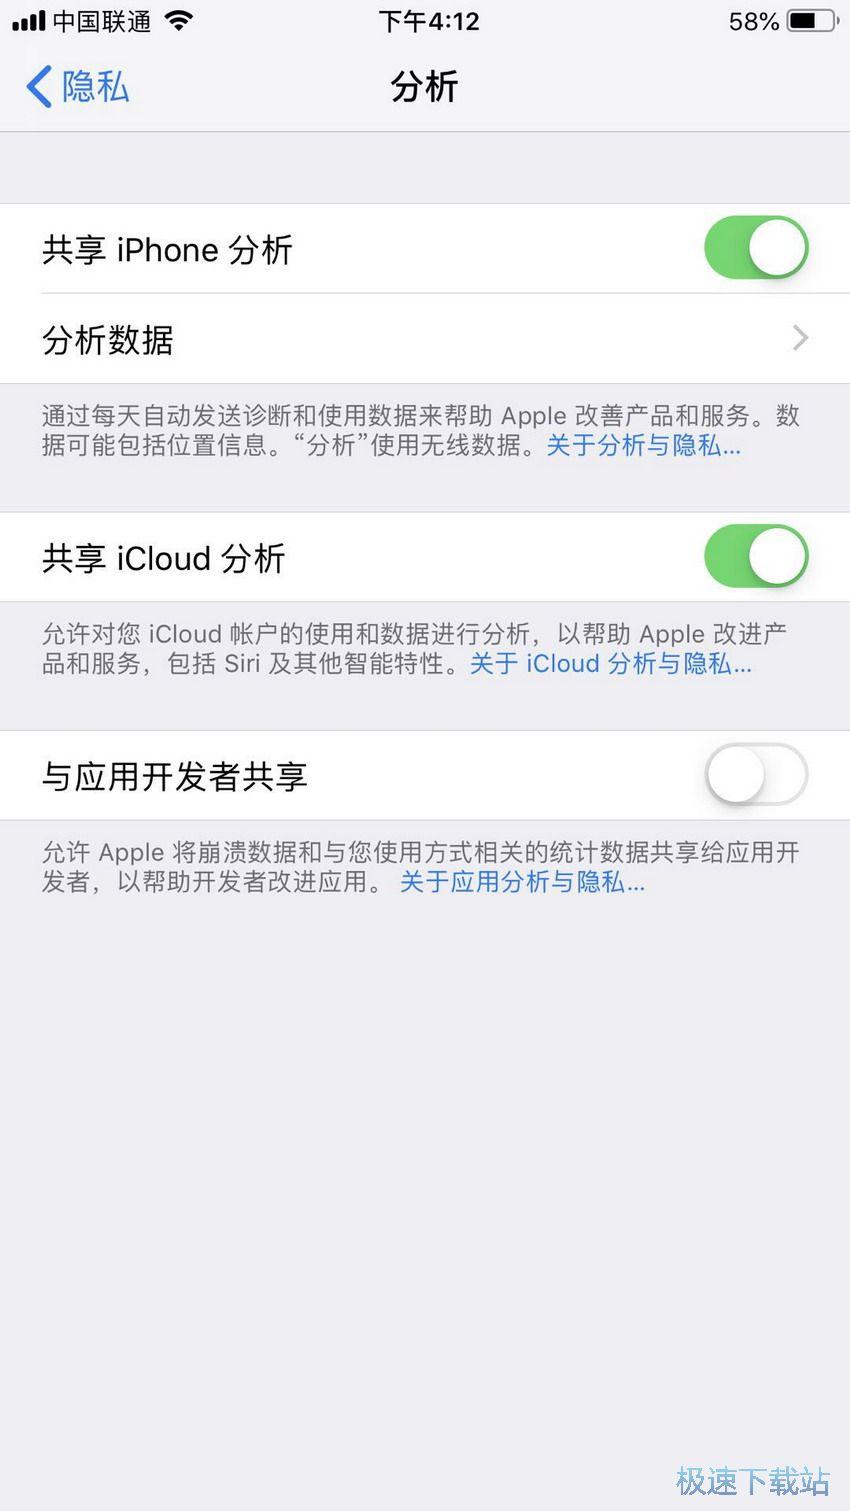 iPhone会自动收集用户哪些信息?怎么关闭? 缩略图